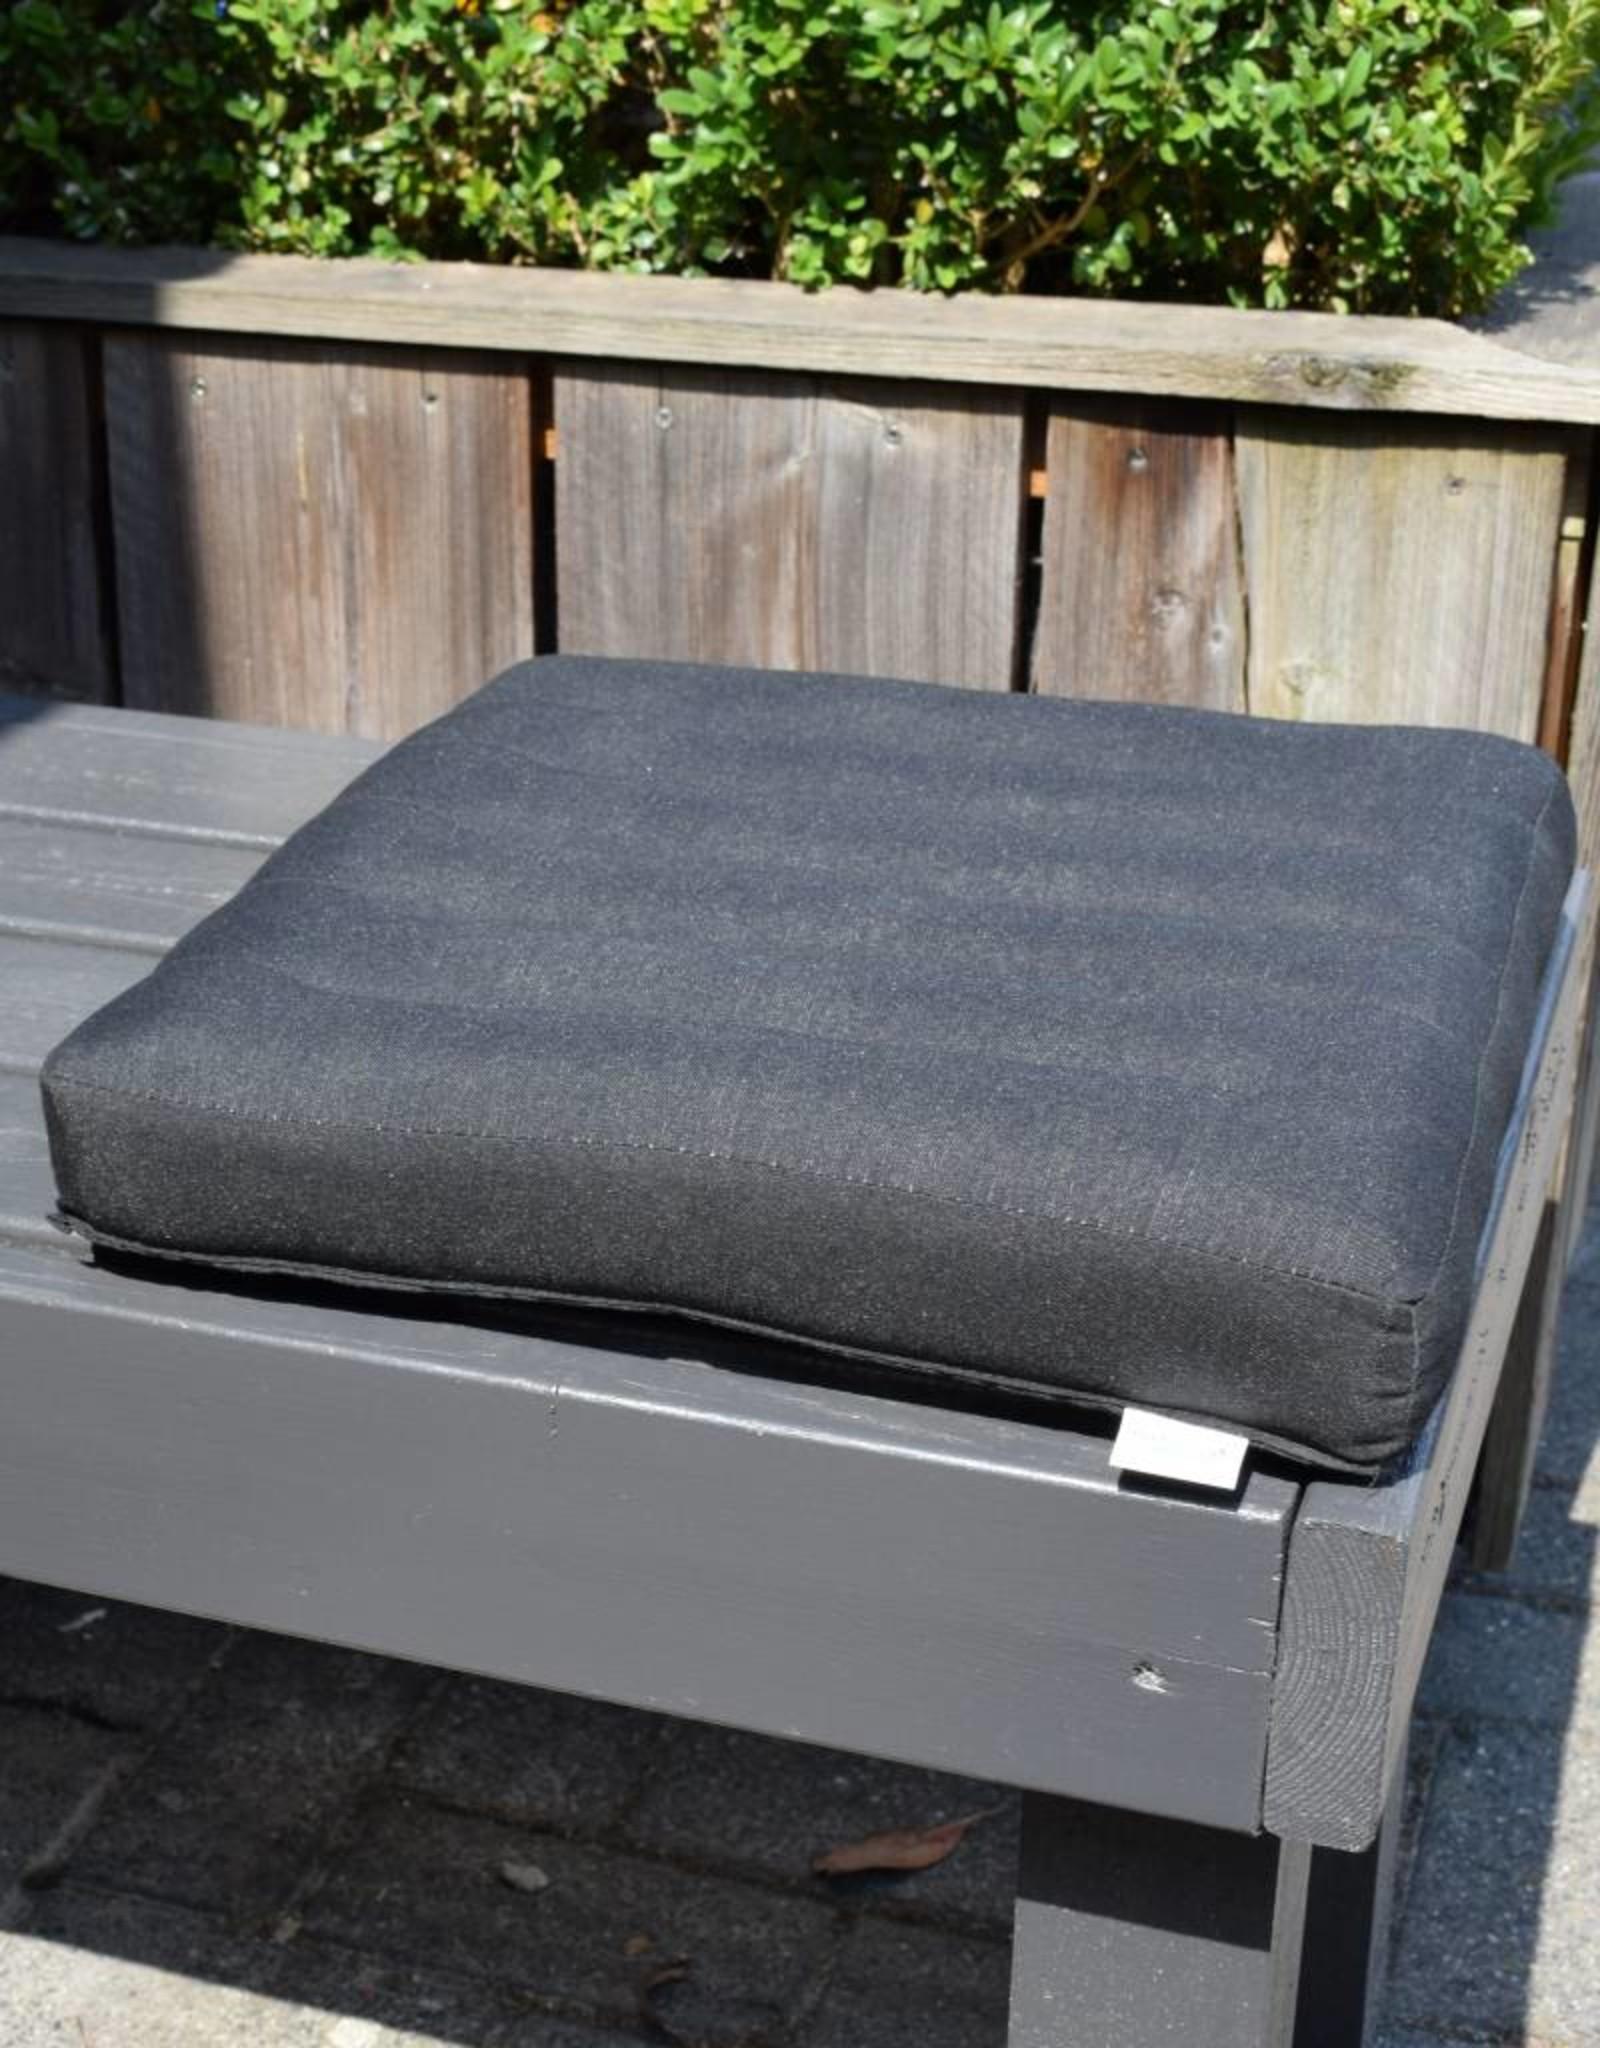 Thai Moonz Thai Seat Cushion and Laptop Cushion (Medium) Black